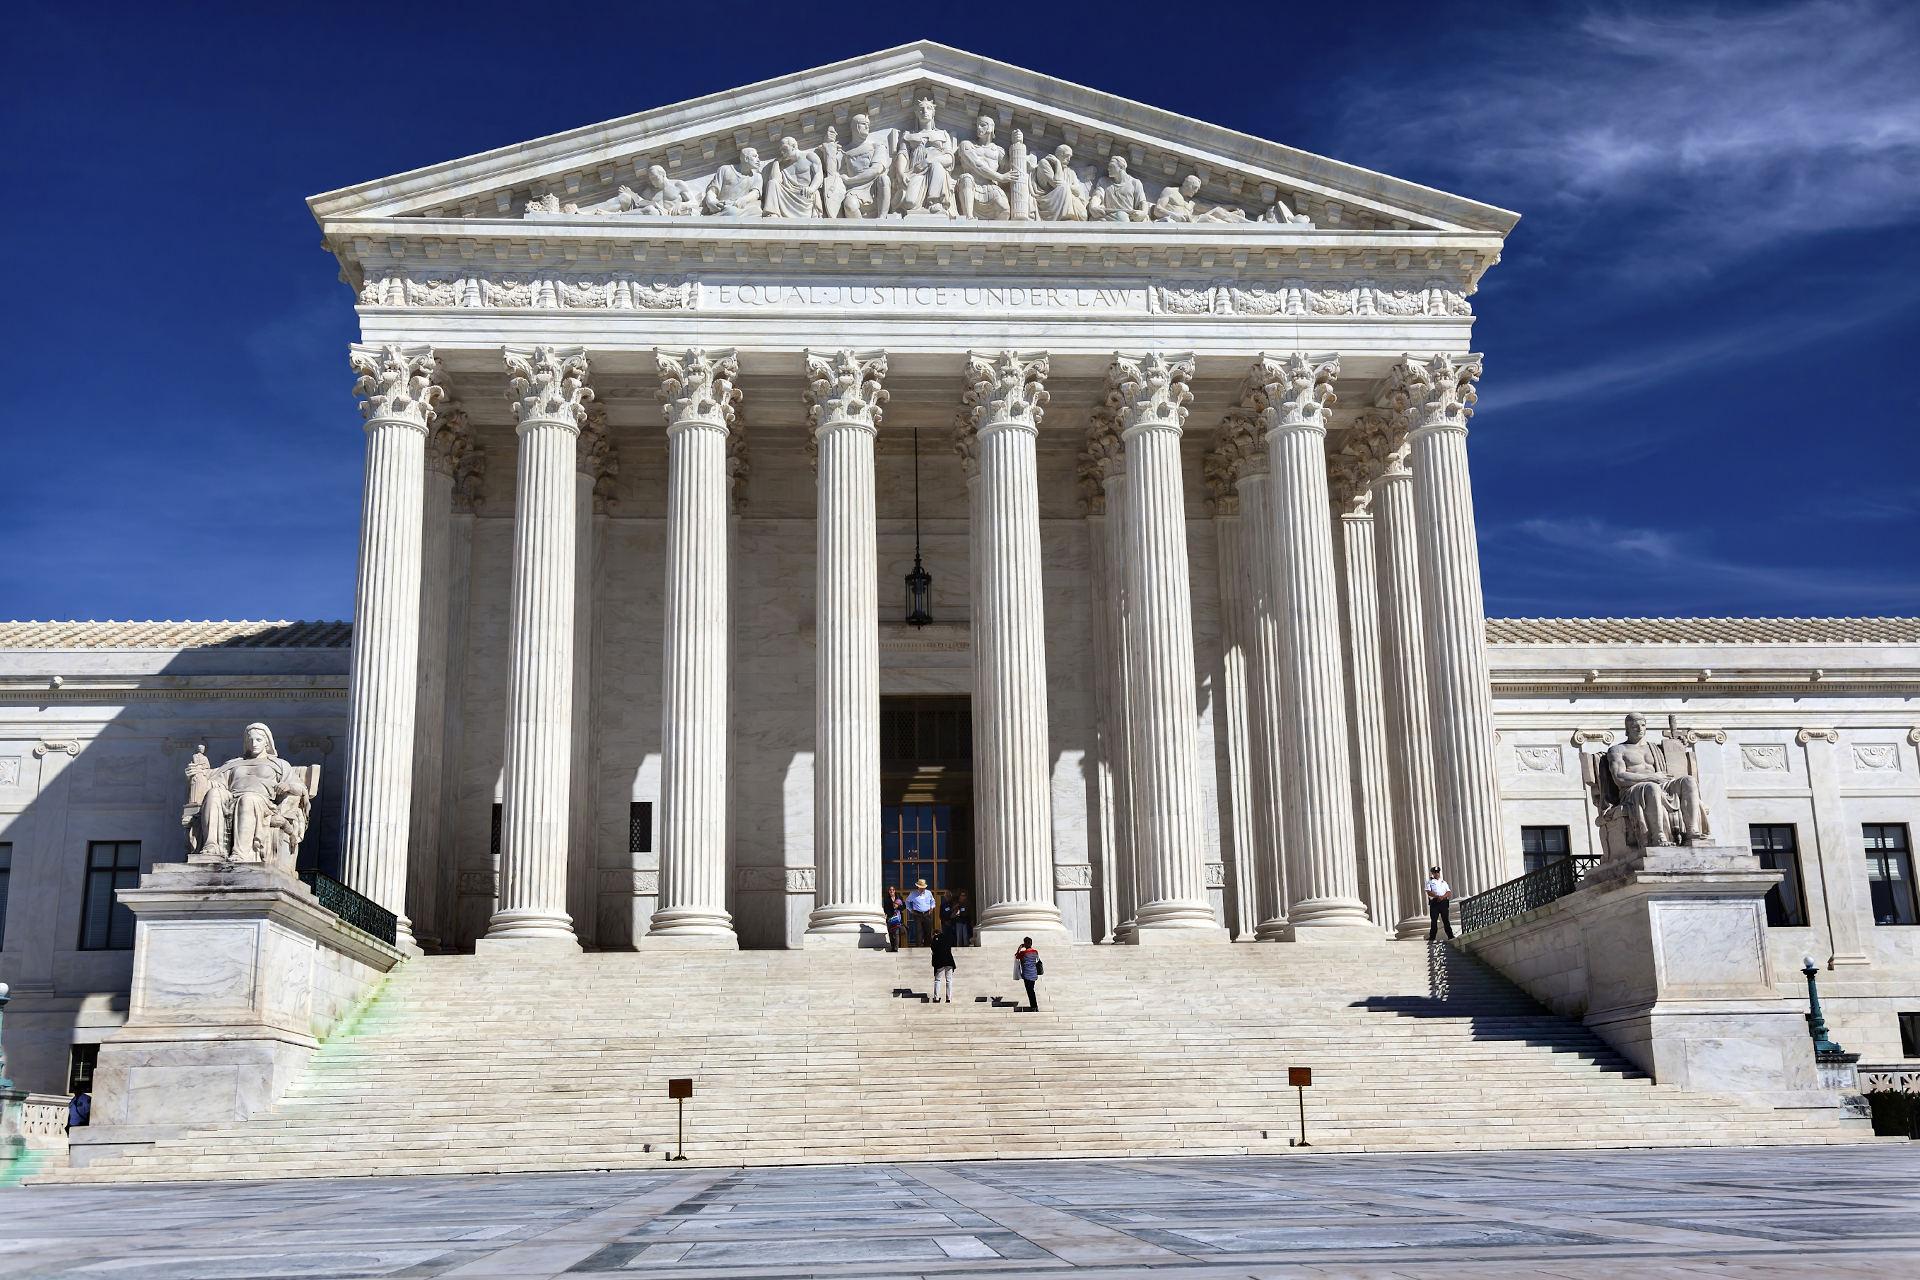 U.S. Supreme Court False Claims Act Liability